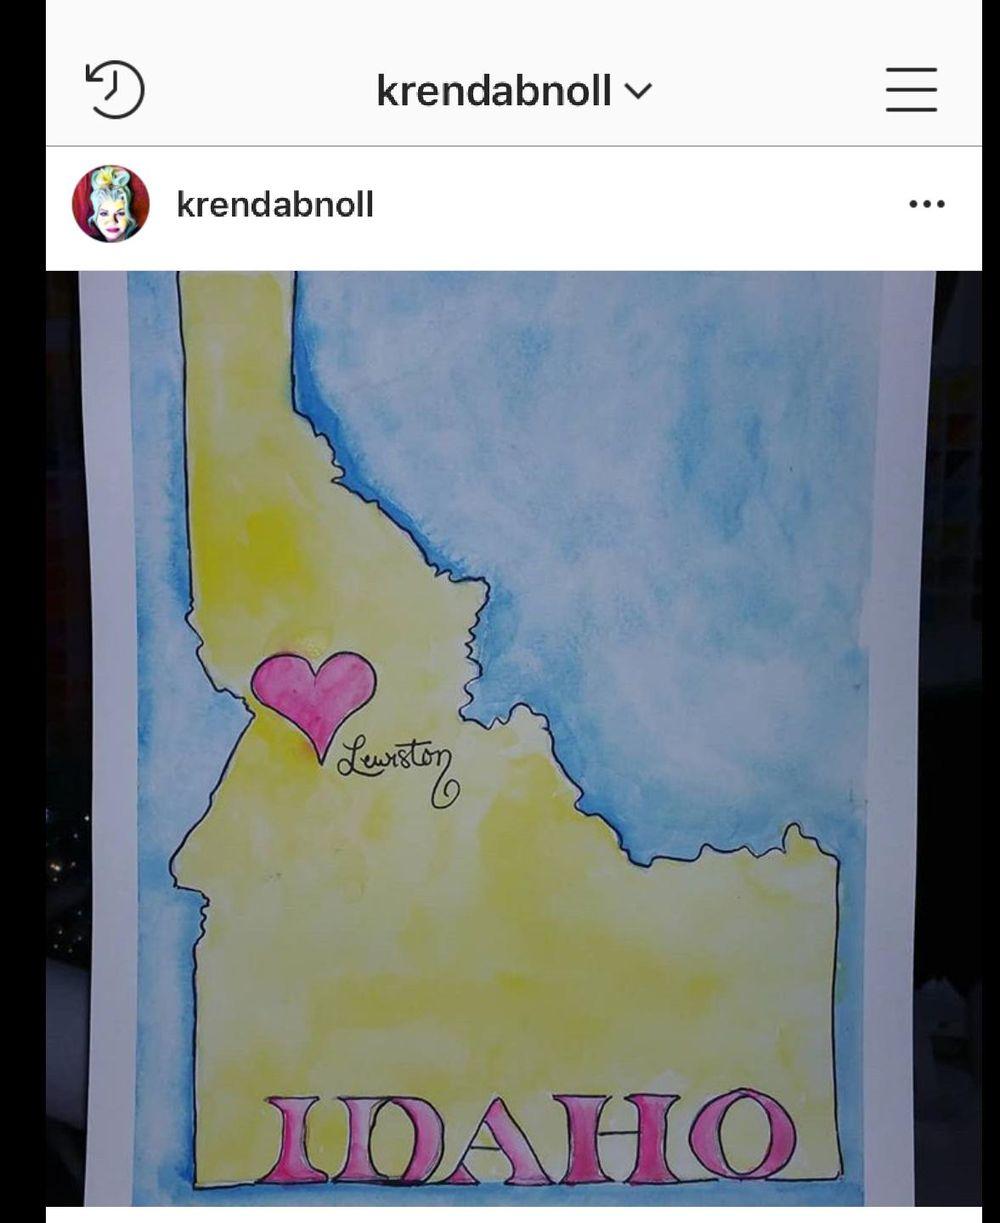 Idaho Love - image 1 - student project